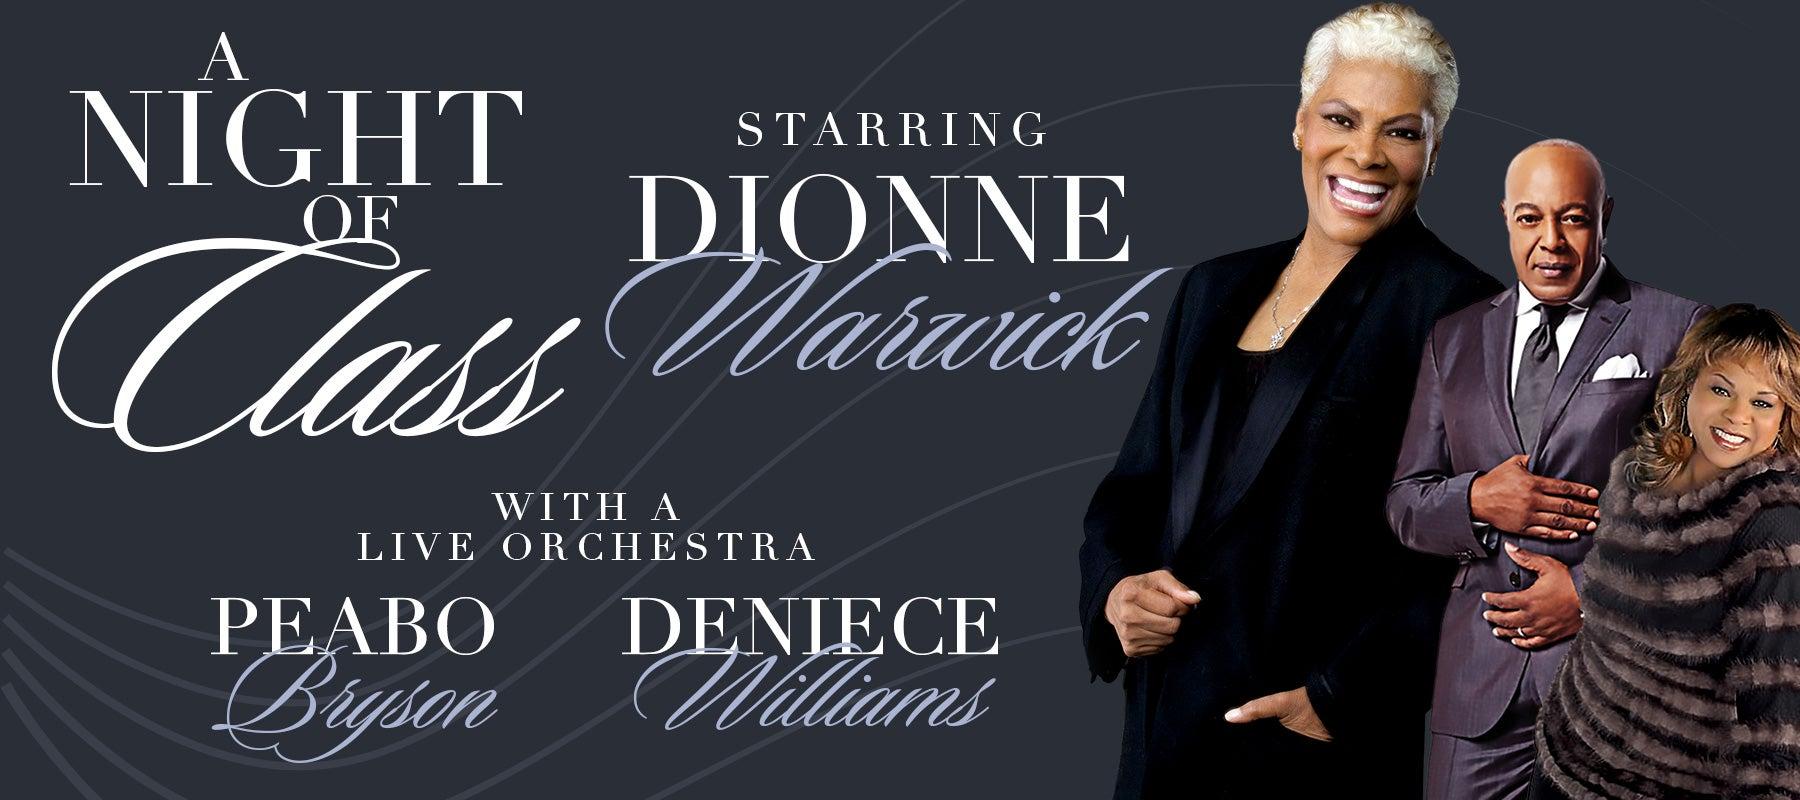 "POSTPONED: ""A Night Of Class"" starring Dionne Warwick"